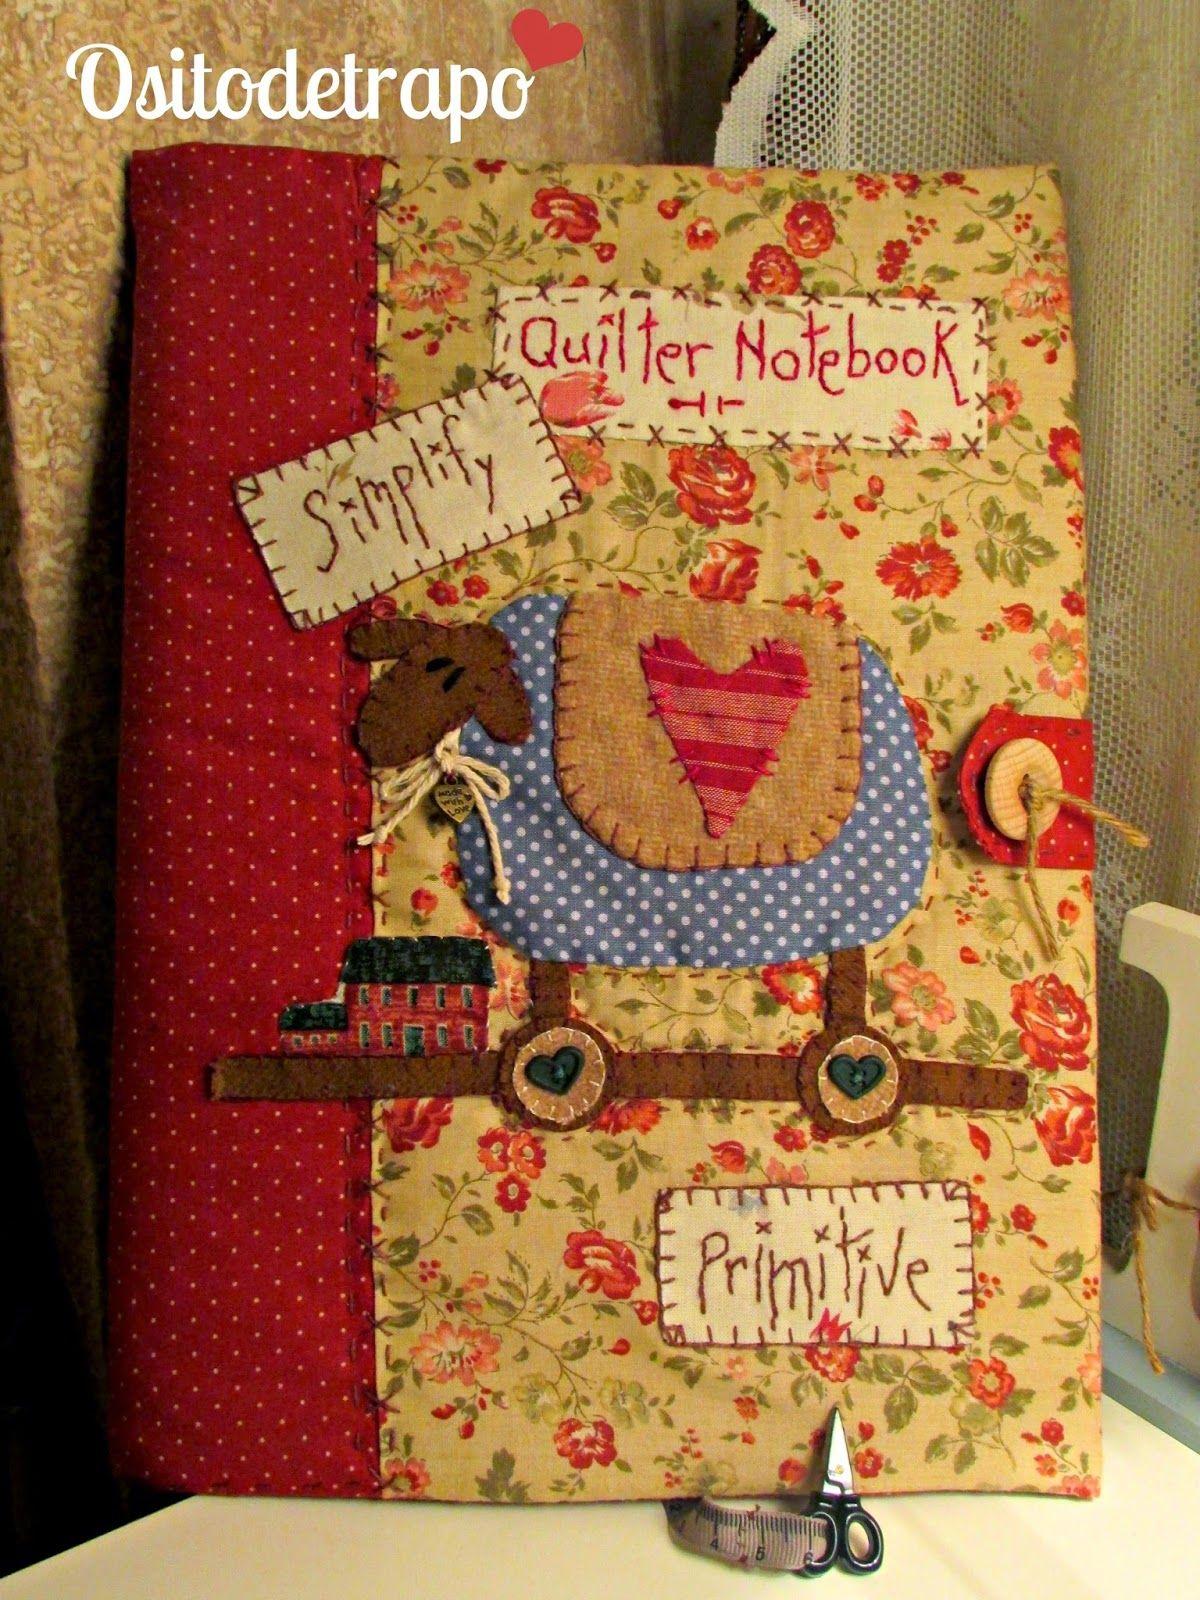 Ositodetrapo: Quilter Notebook